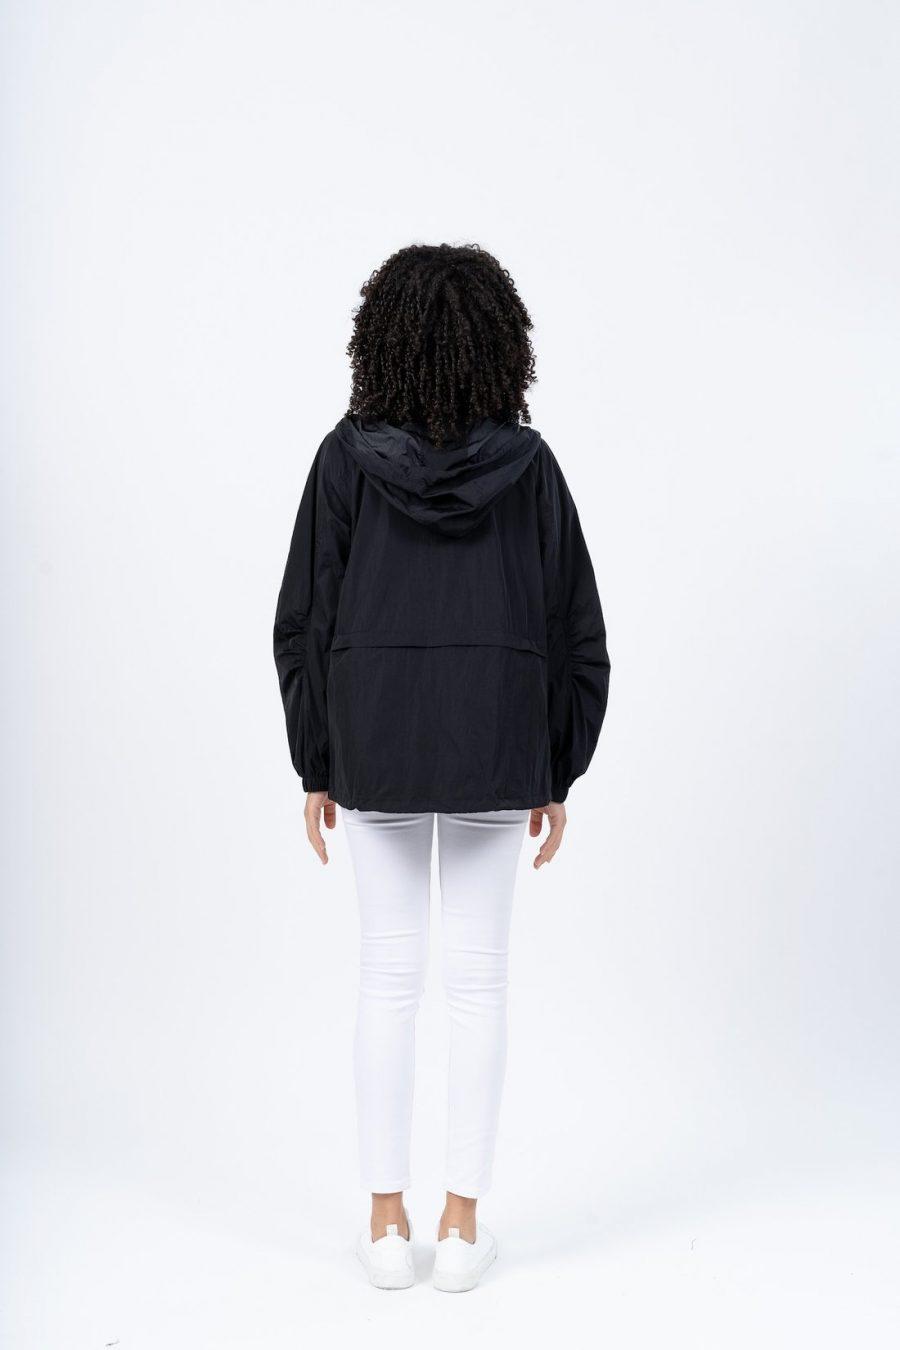 Flotte-Noir-Femme-3_1100x